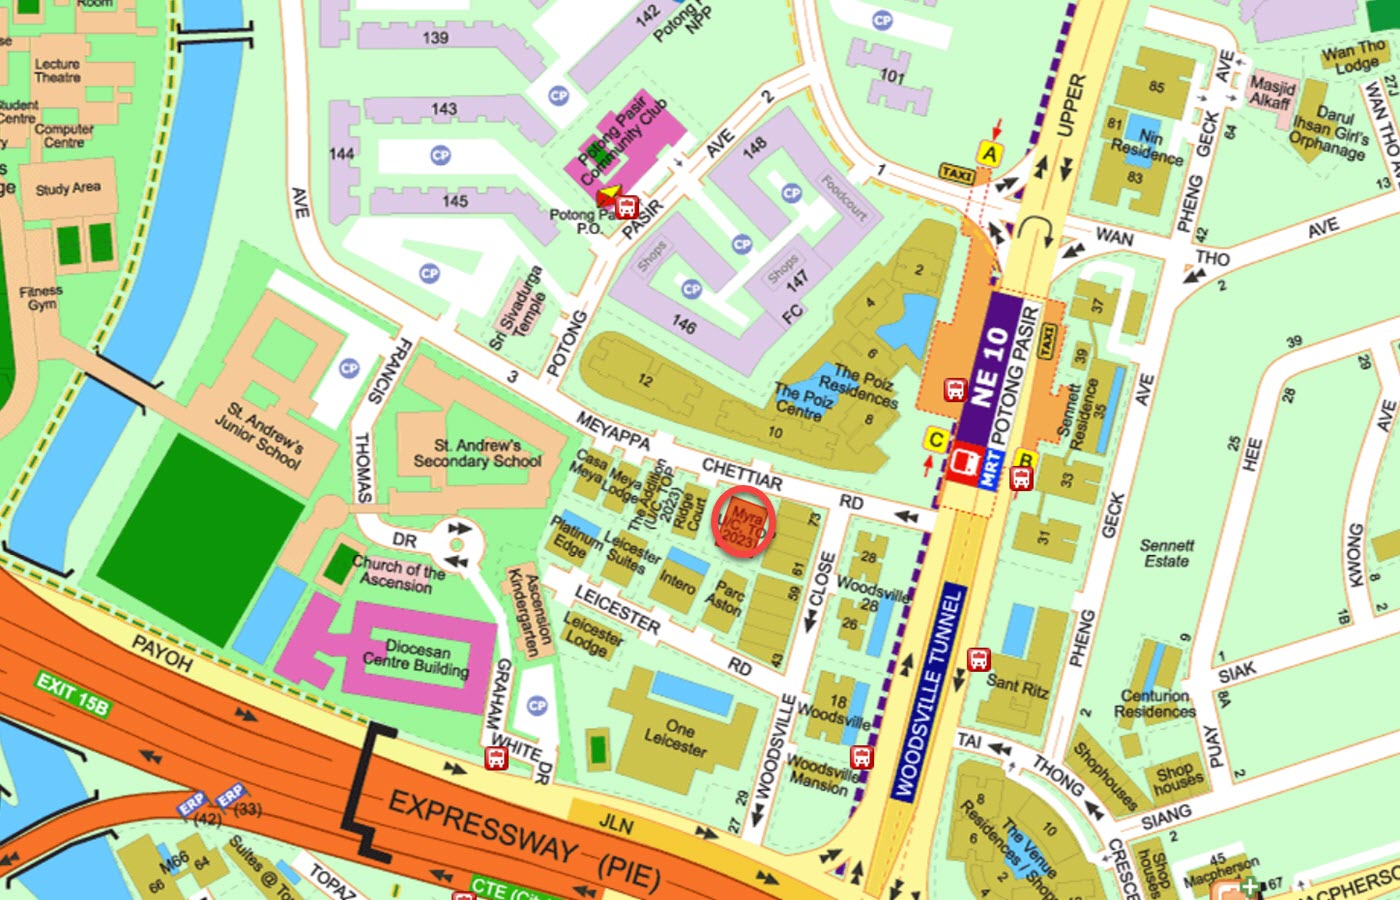 MYRA Condo Location - Street Directory Map